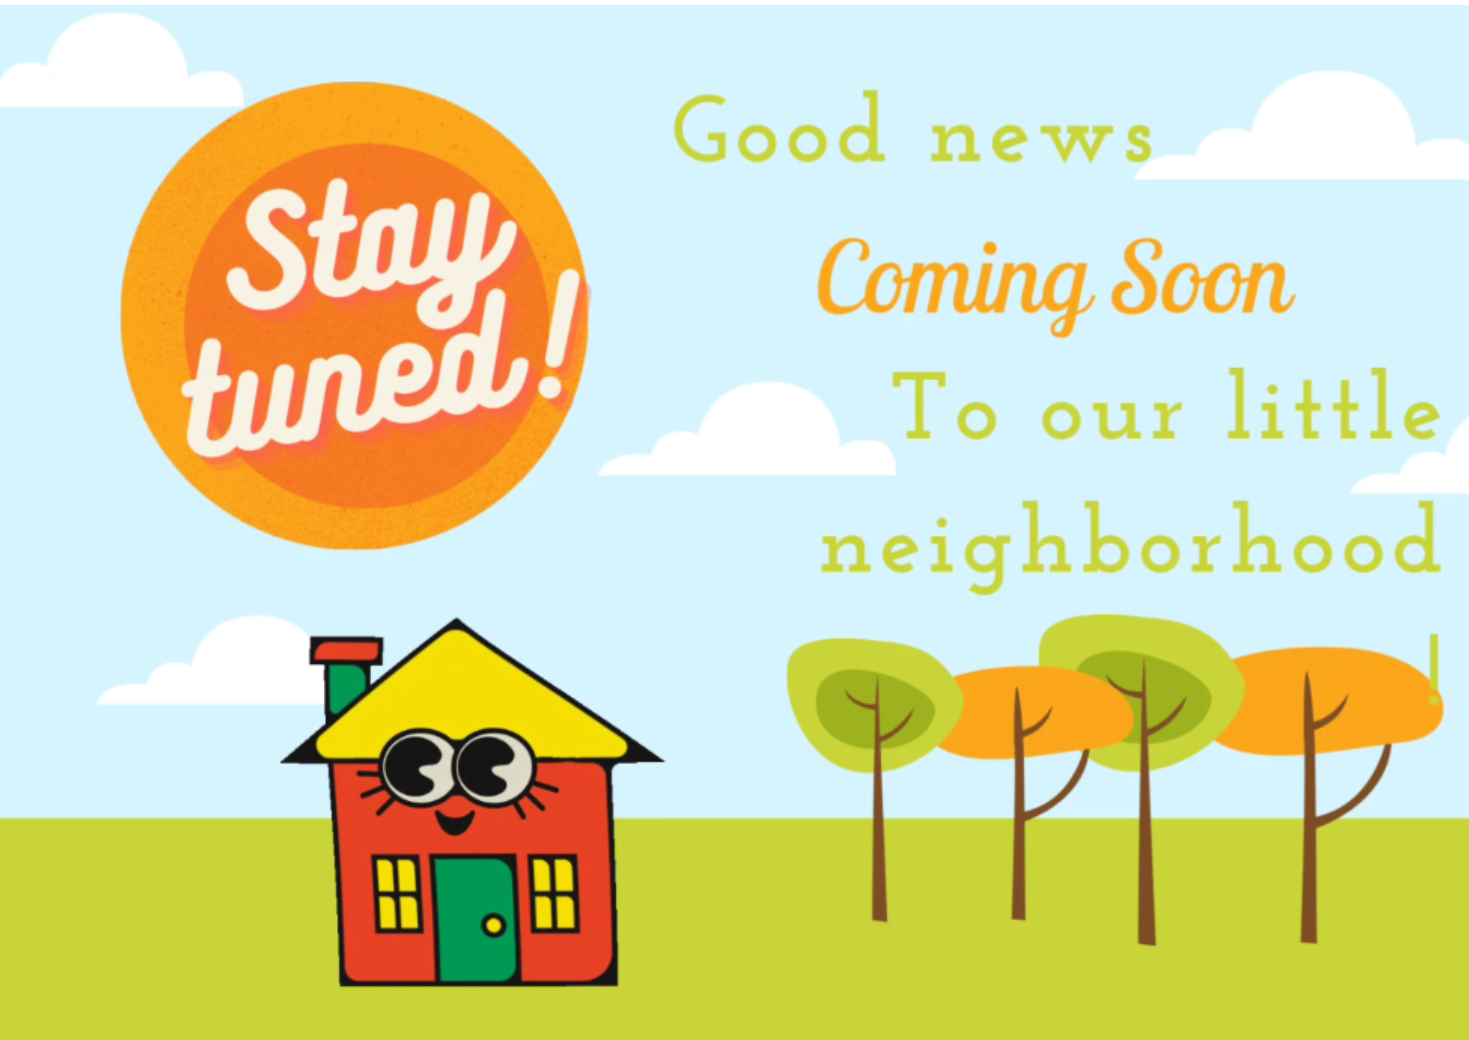 Good news coming soon!